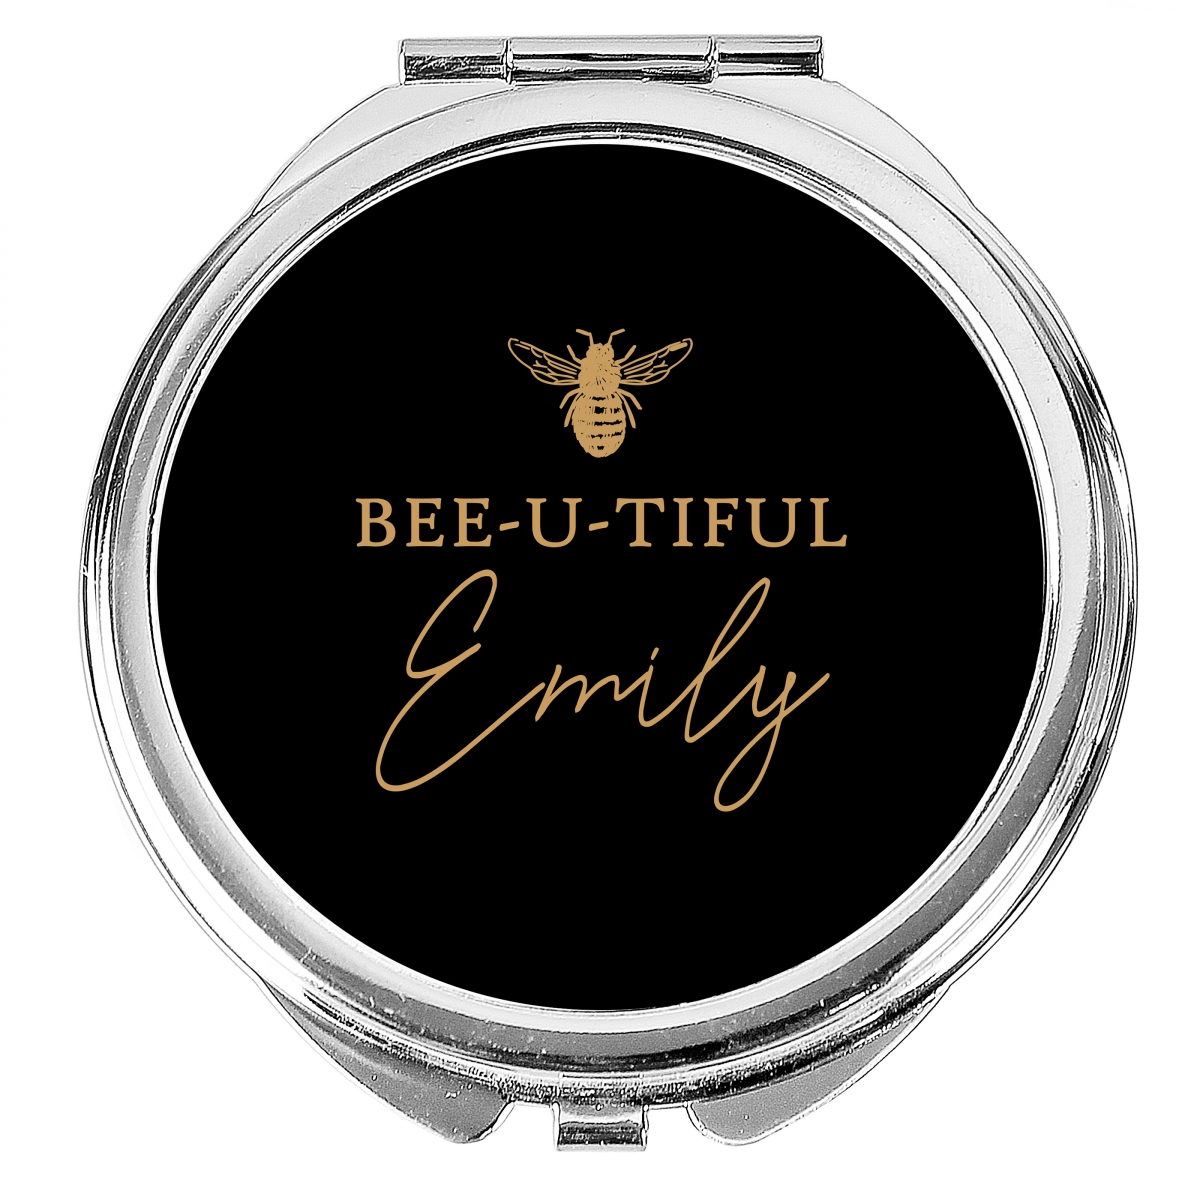 Personalised Bee-u-tiful Compact Mirror